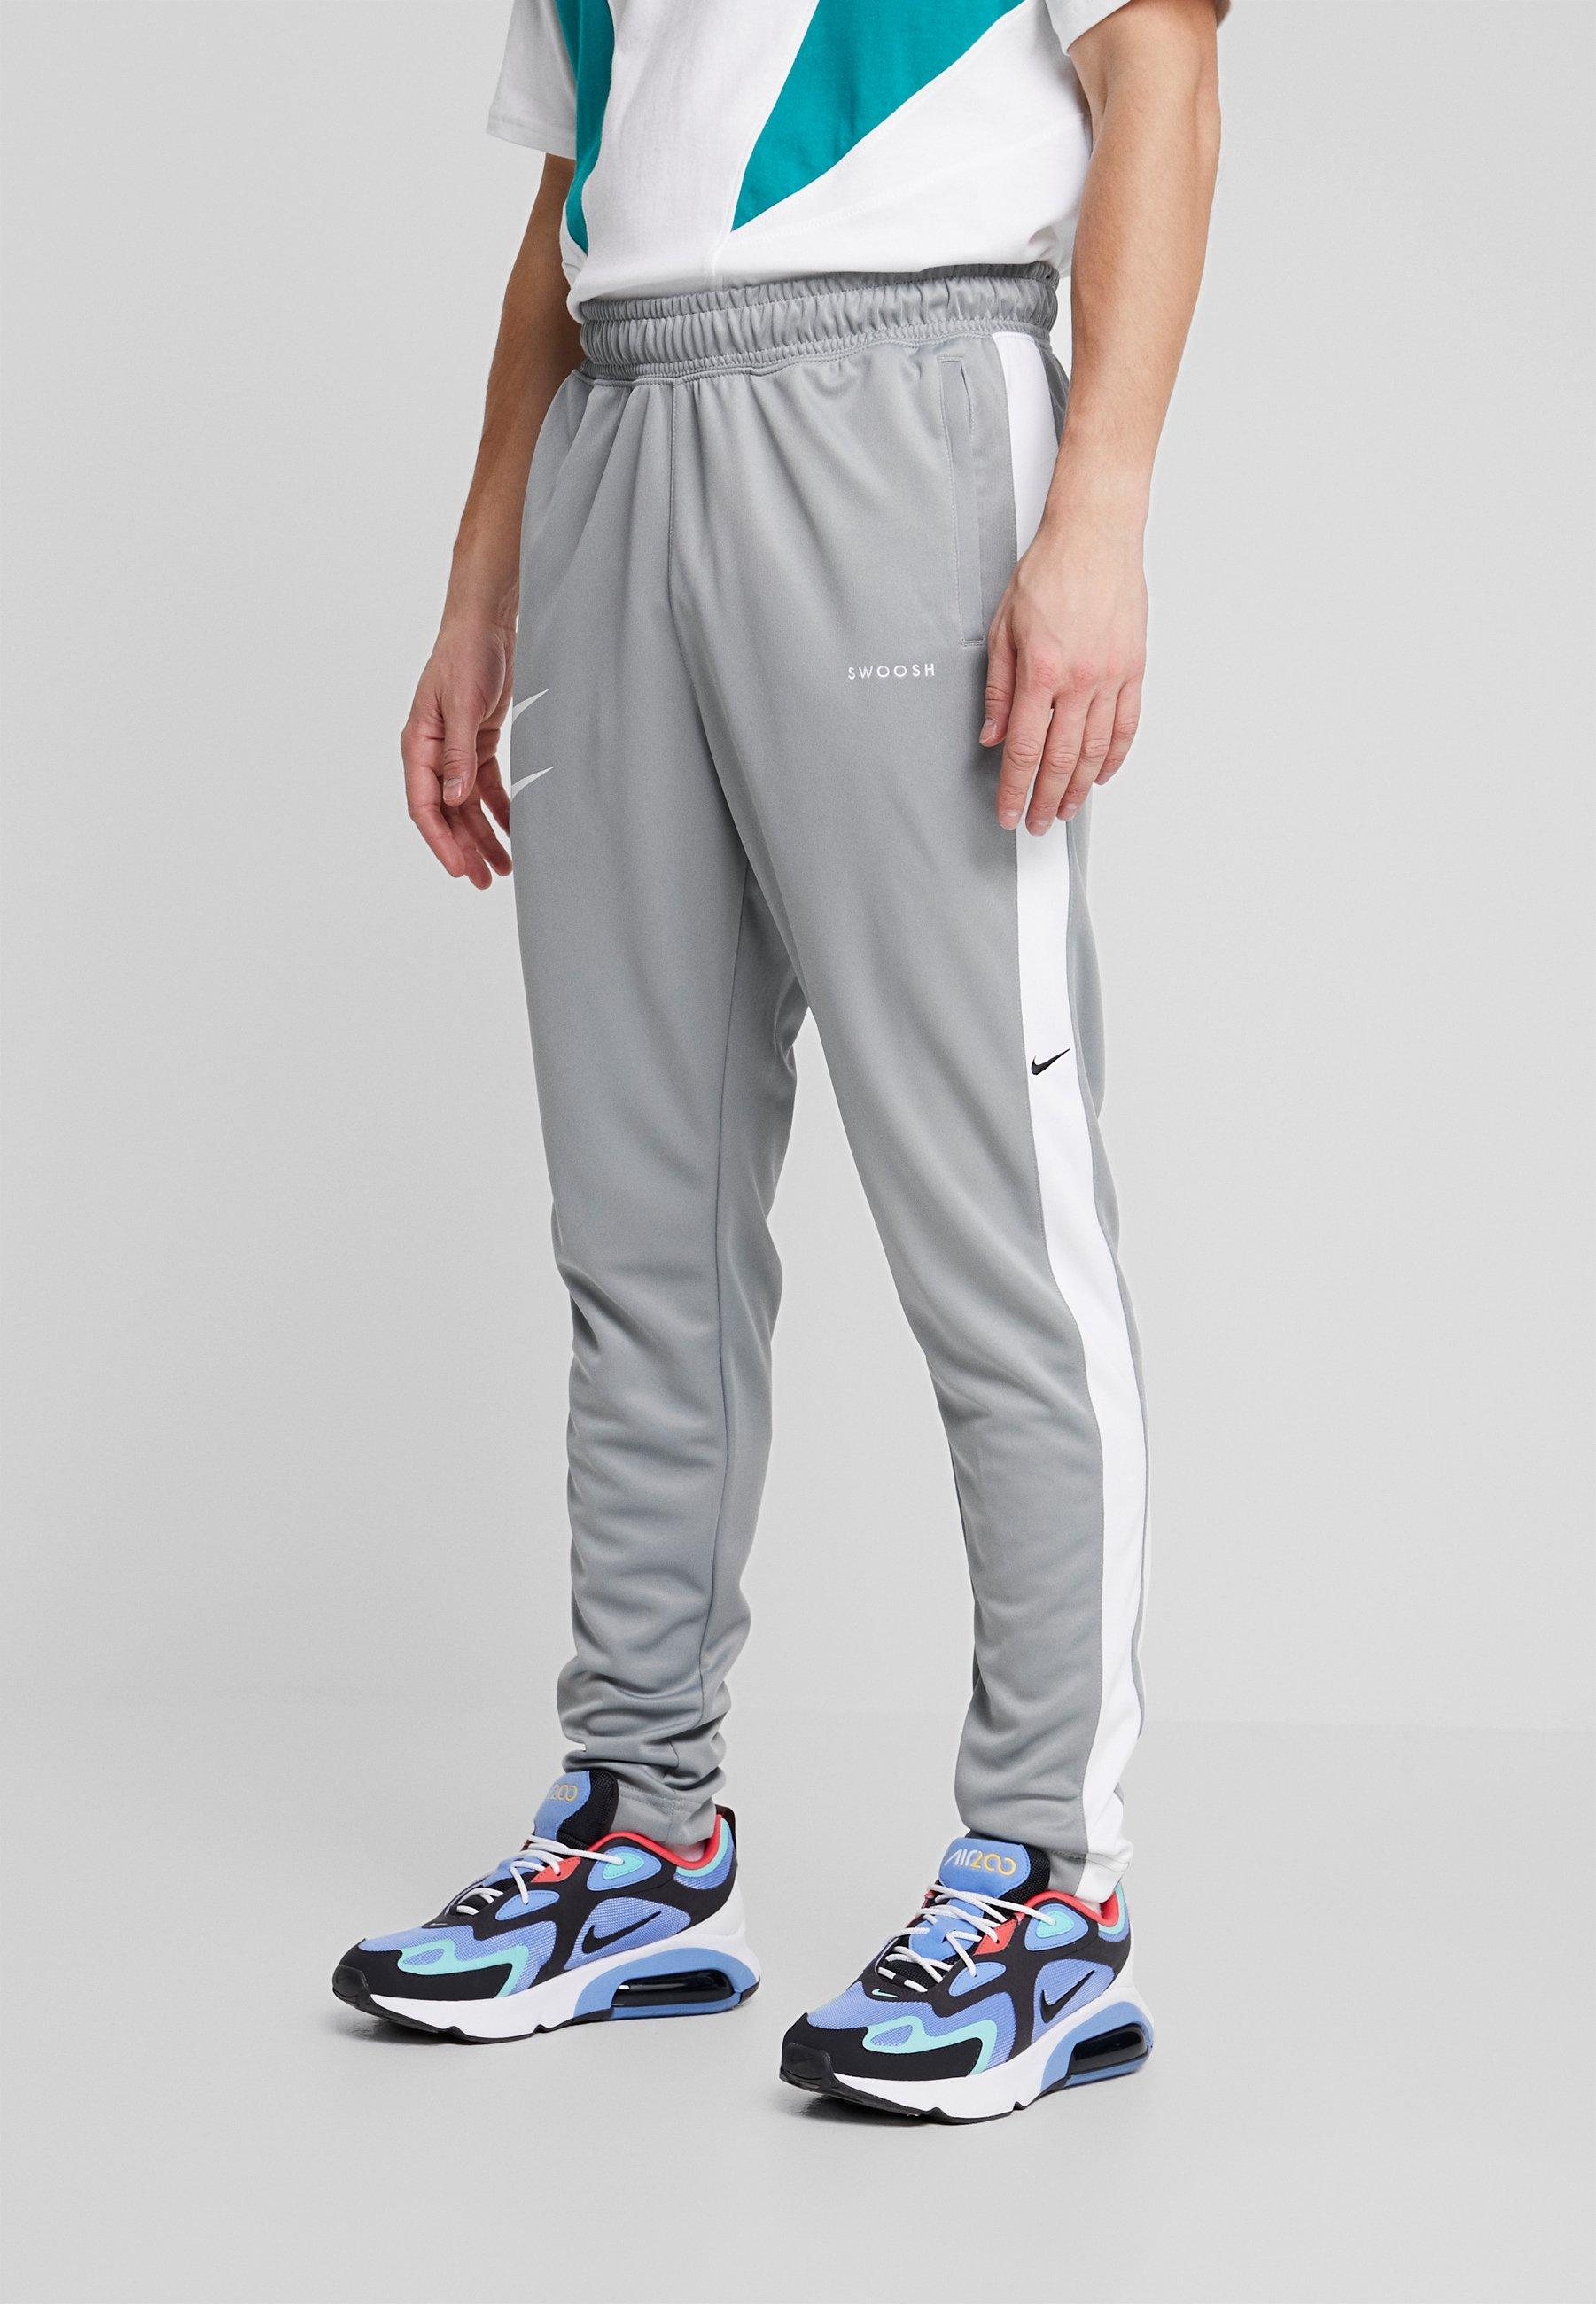 Nike Sportswear Trainingsbroek Particle Grey/white/black 1om5YvOV vdzEkQbU